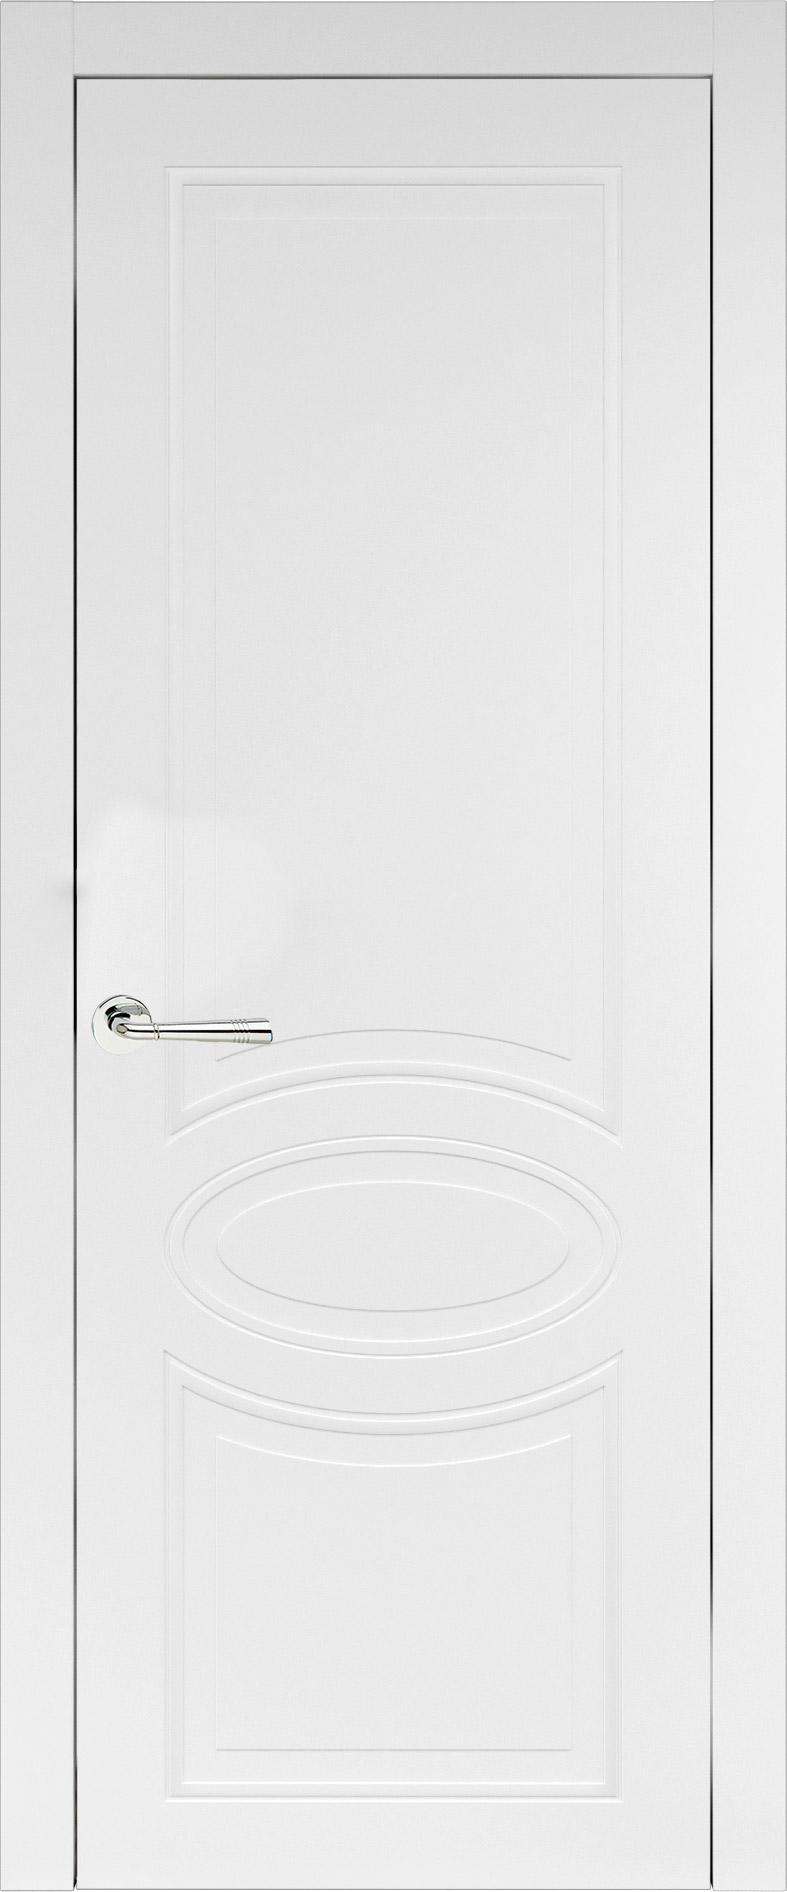 Florencia Neo Classic цвет - Белая эмаль (RAL 9003) Без стекла (ДГ)